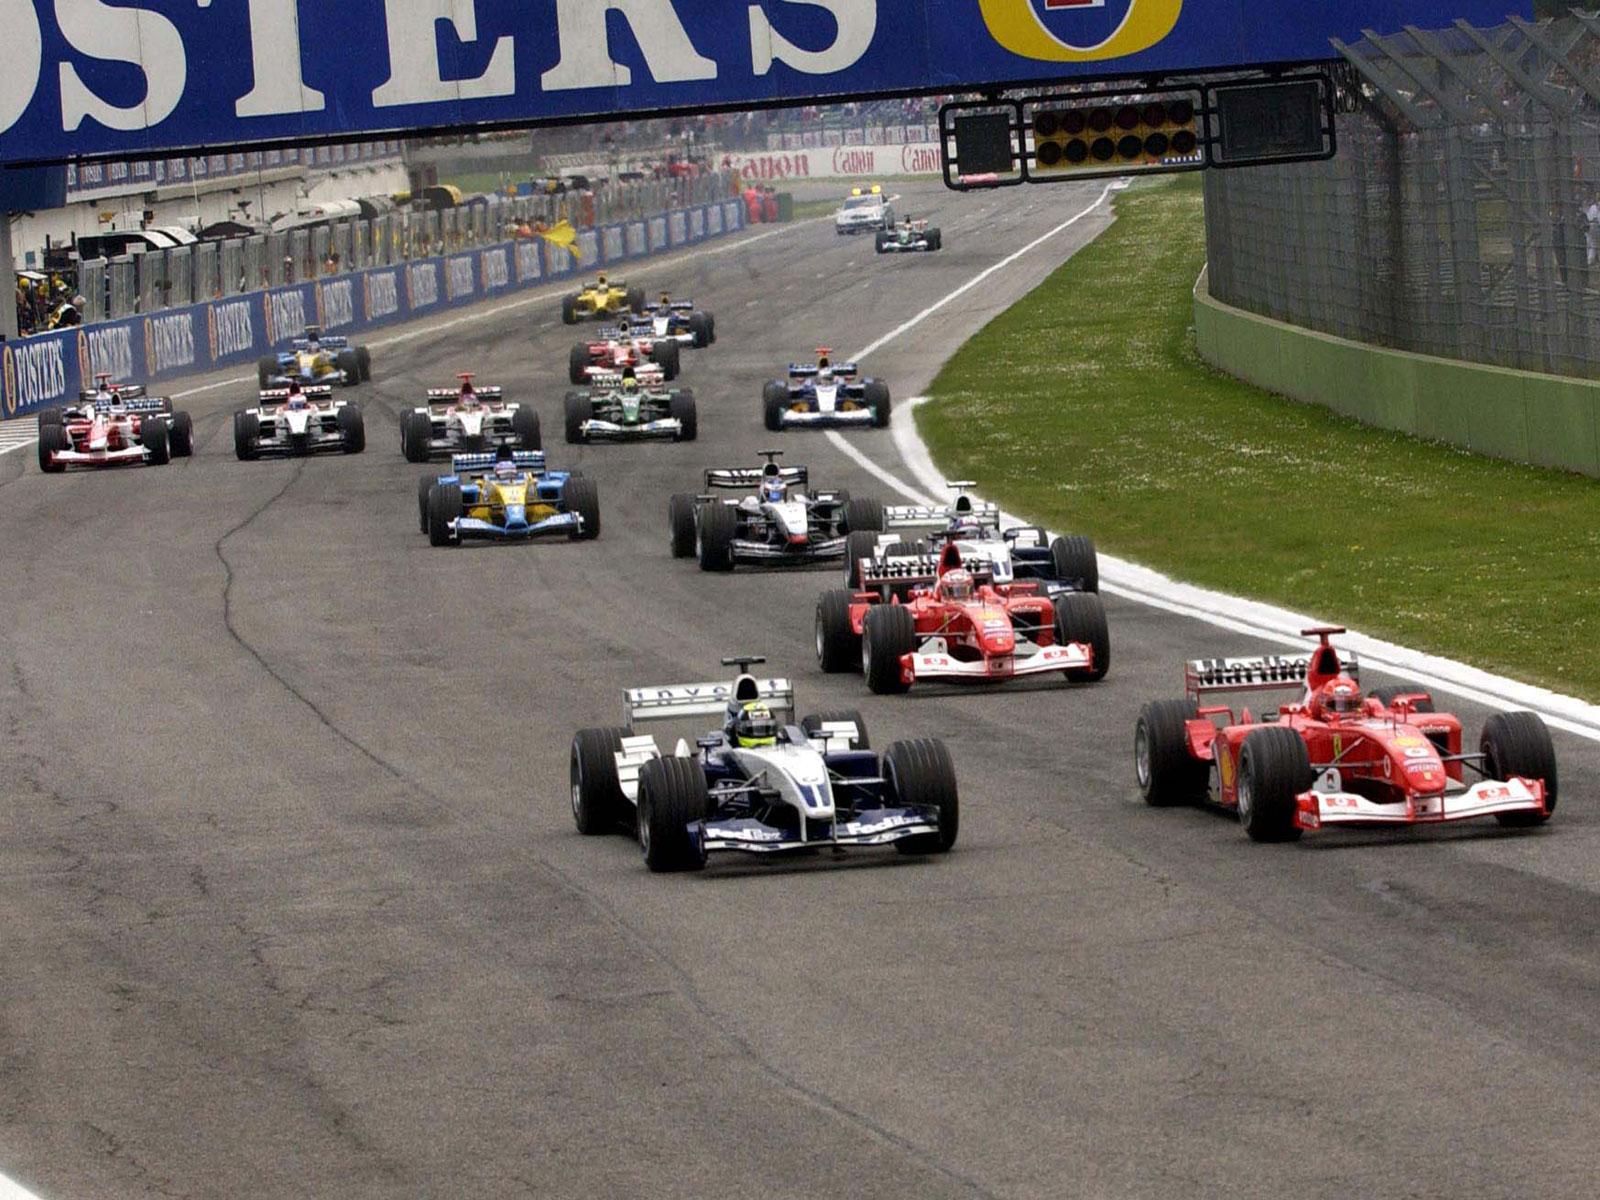 Start of 2003 San Marino F1 GP on Imola